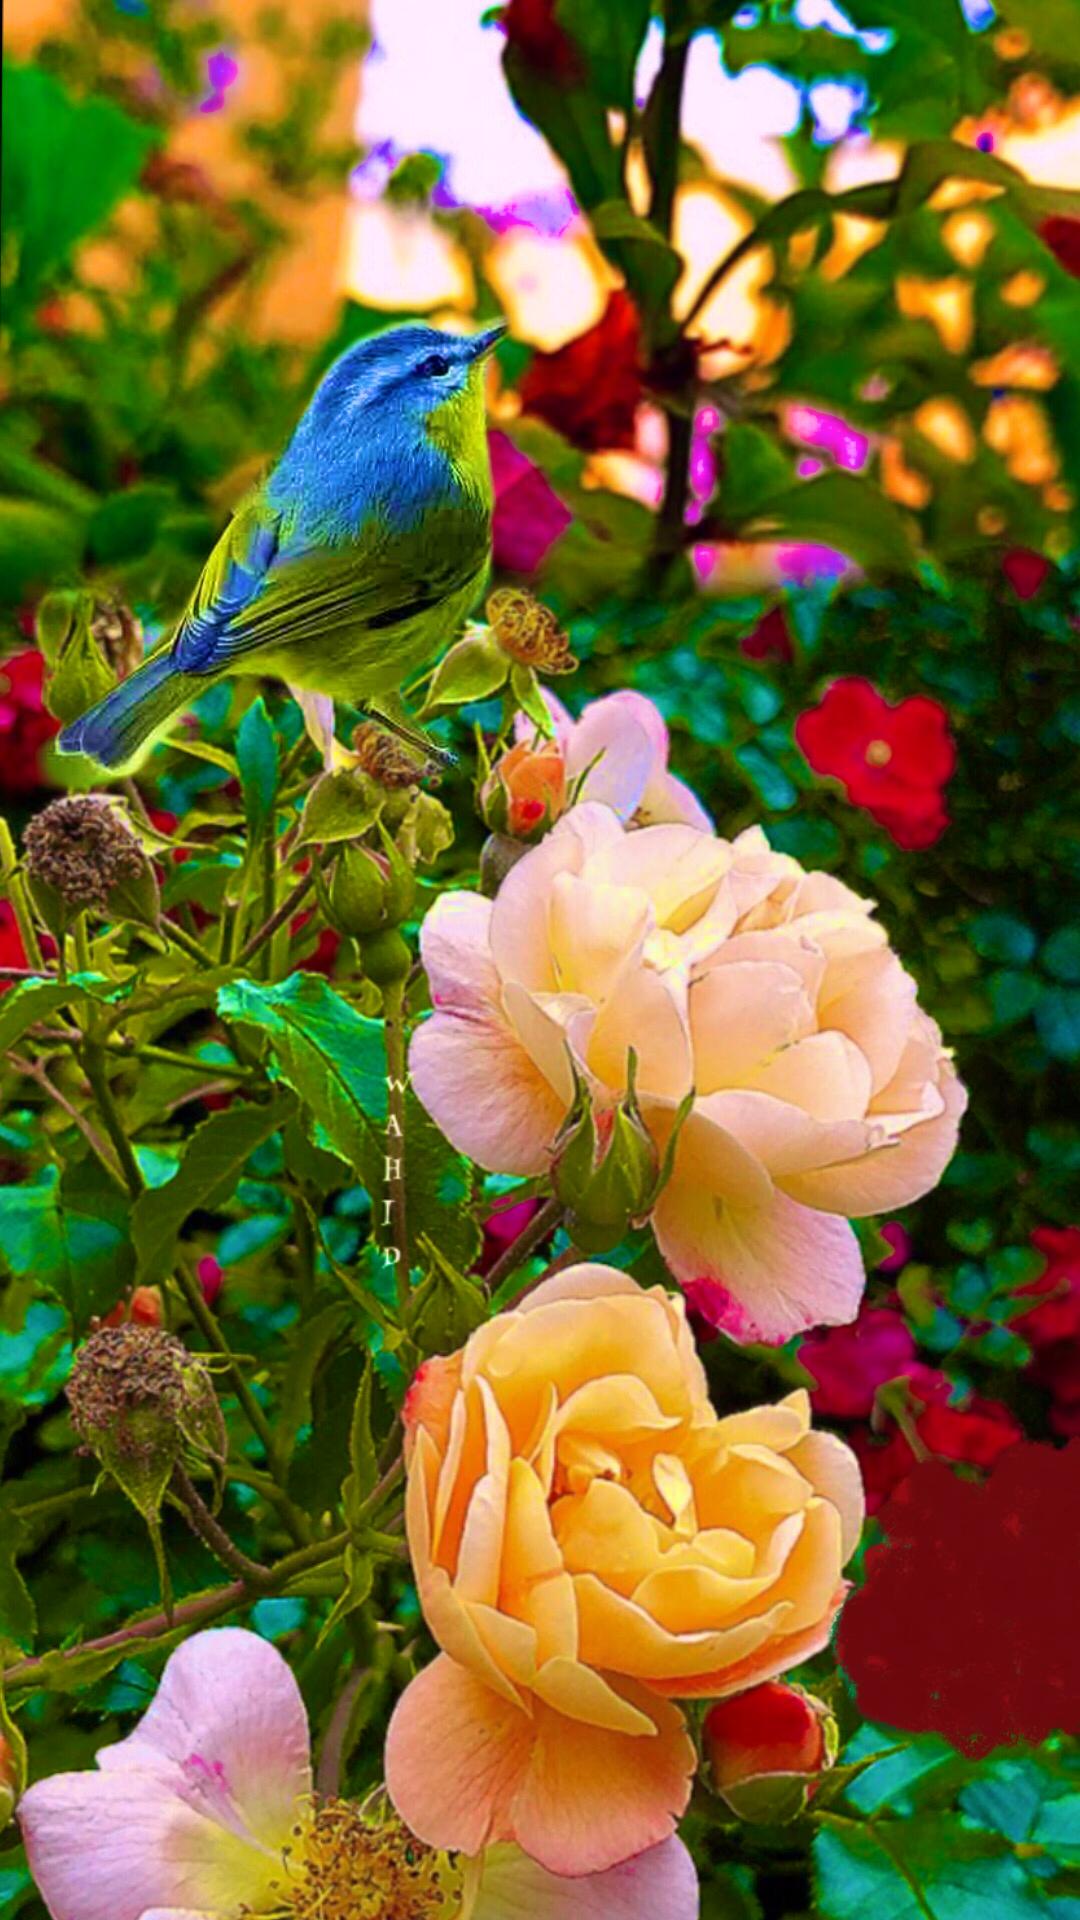 Pin By Jasmine George On Zhivotni Beautiful Birds Cute Birds Bird Pictures